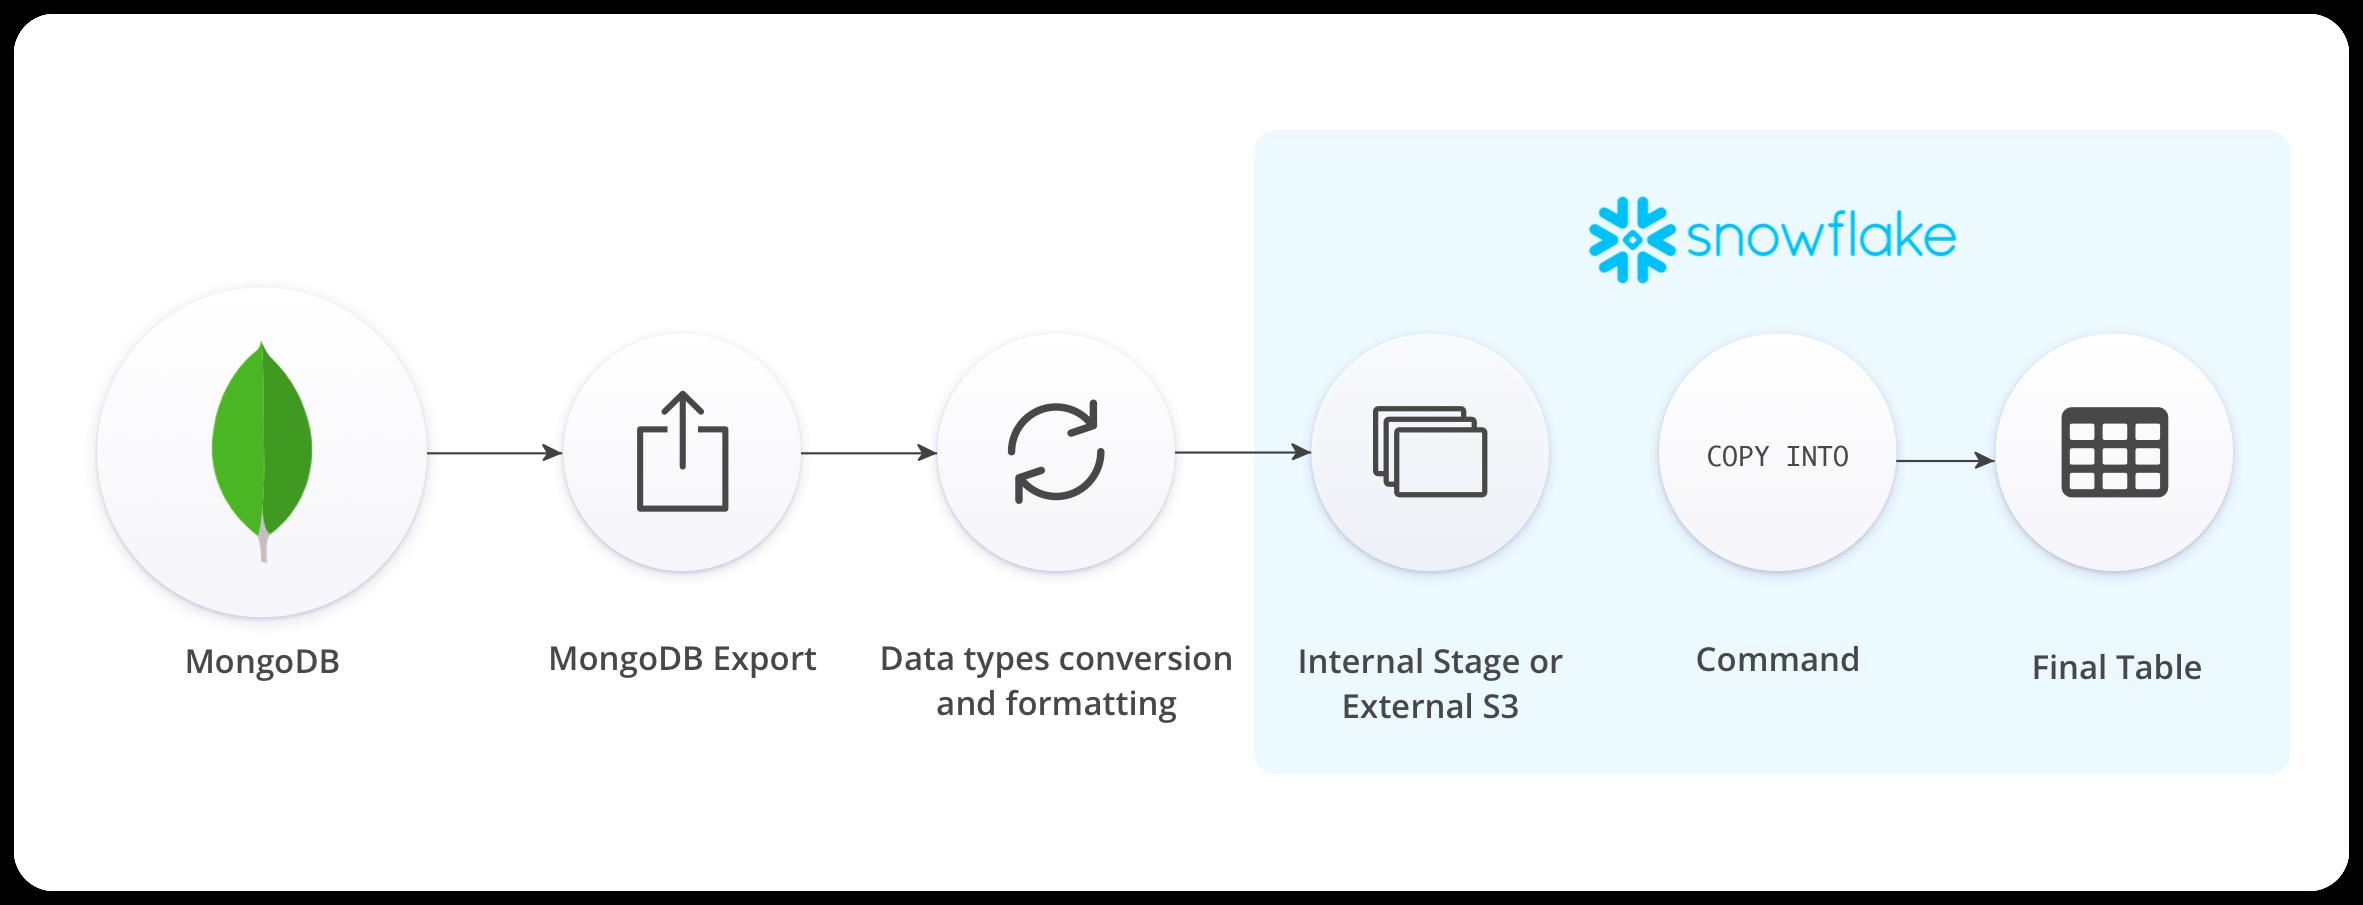 MongoDB to Snowflake - Steps to Migrate Data | Hevo Blog